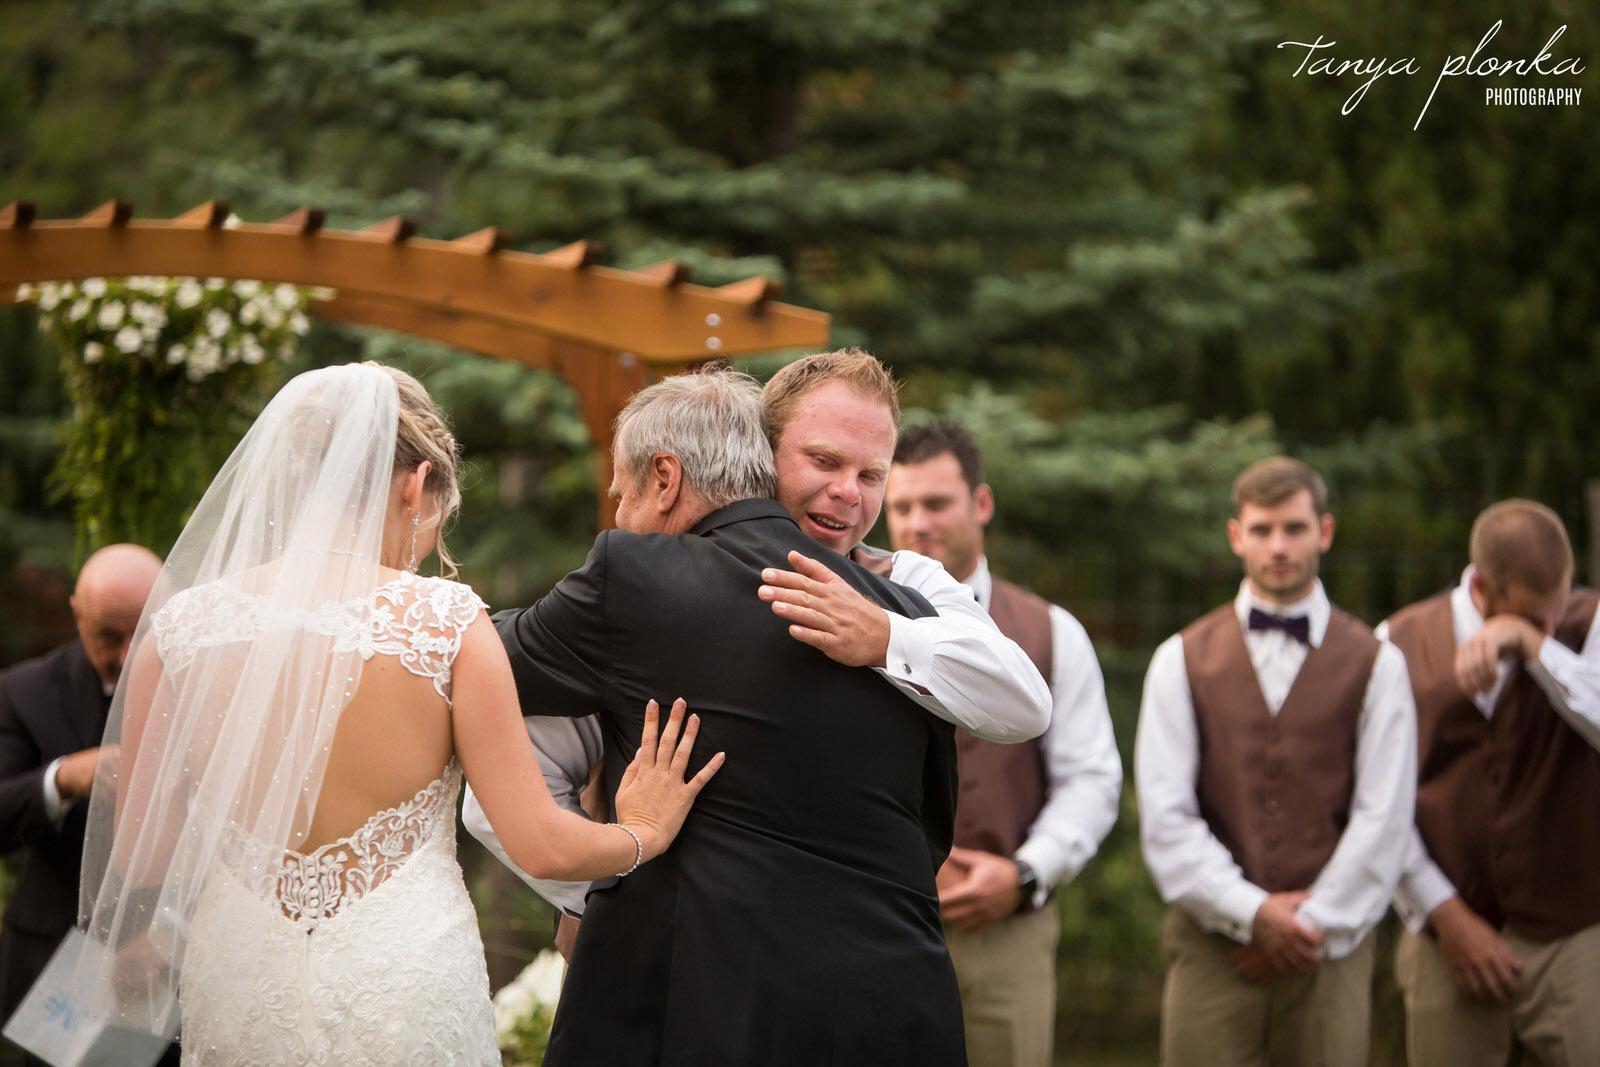 emotional groom hugs bride's dad at wedding ceremony while groomsman in background wipes away tear